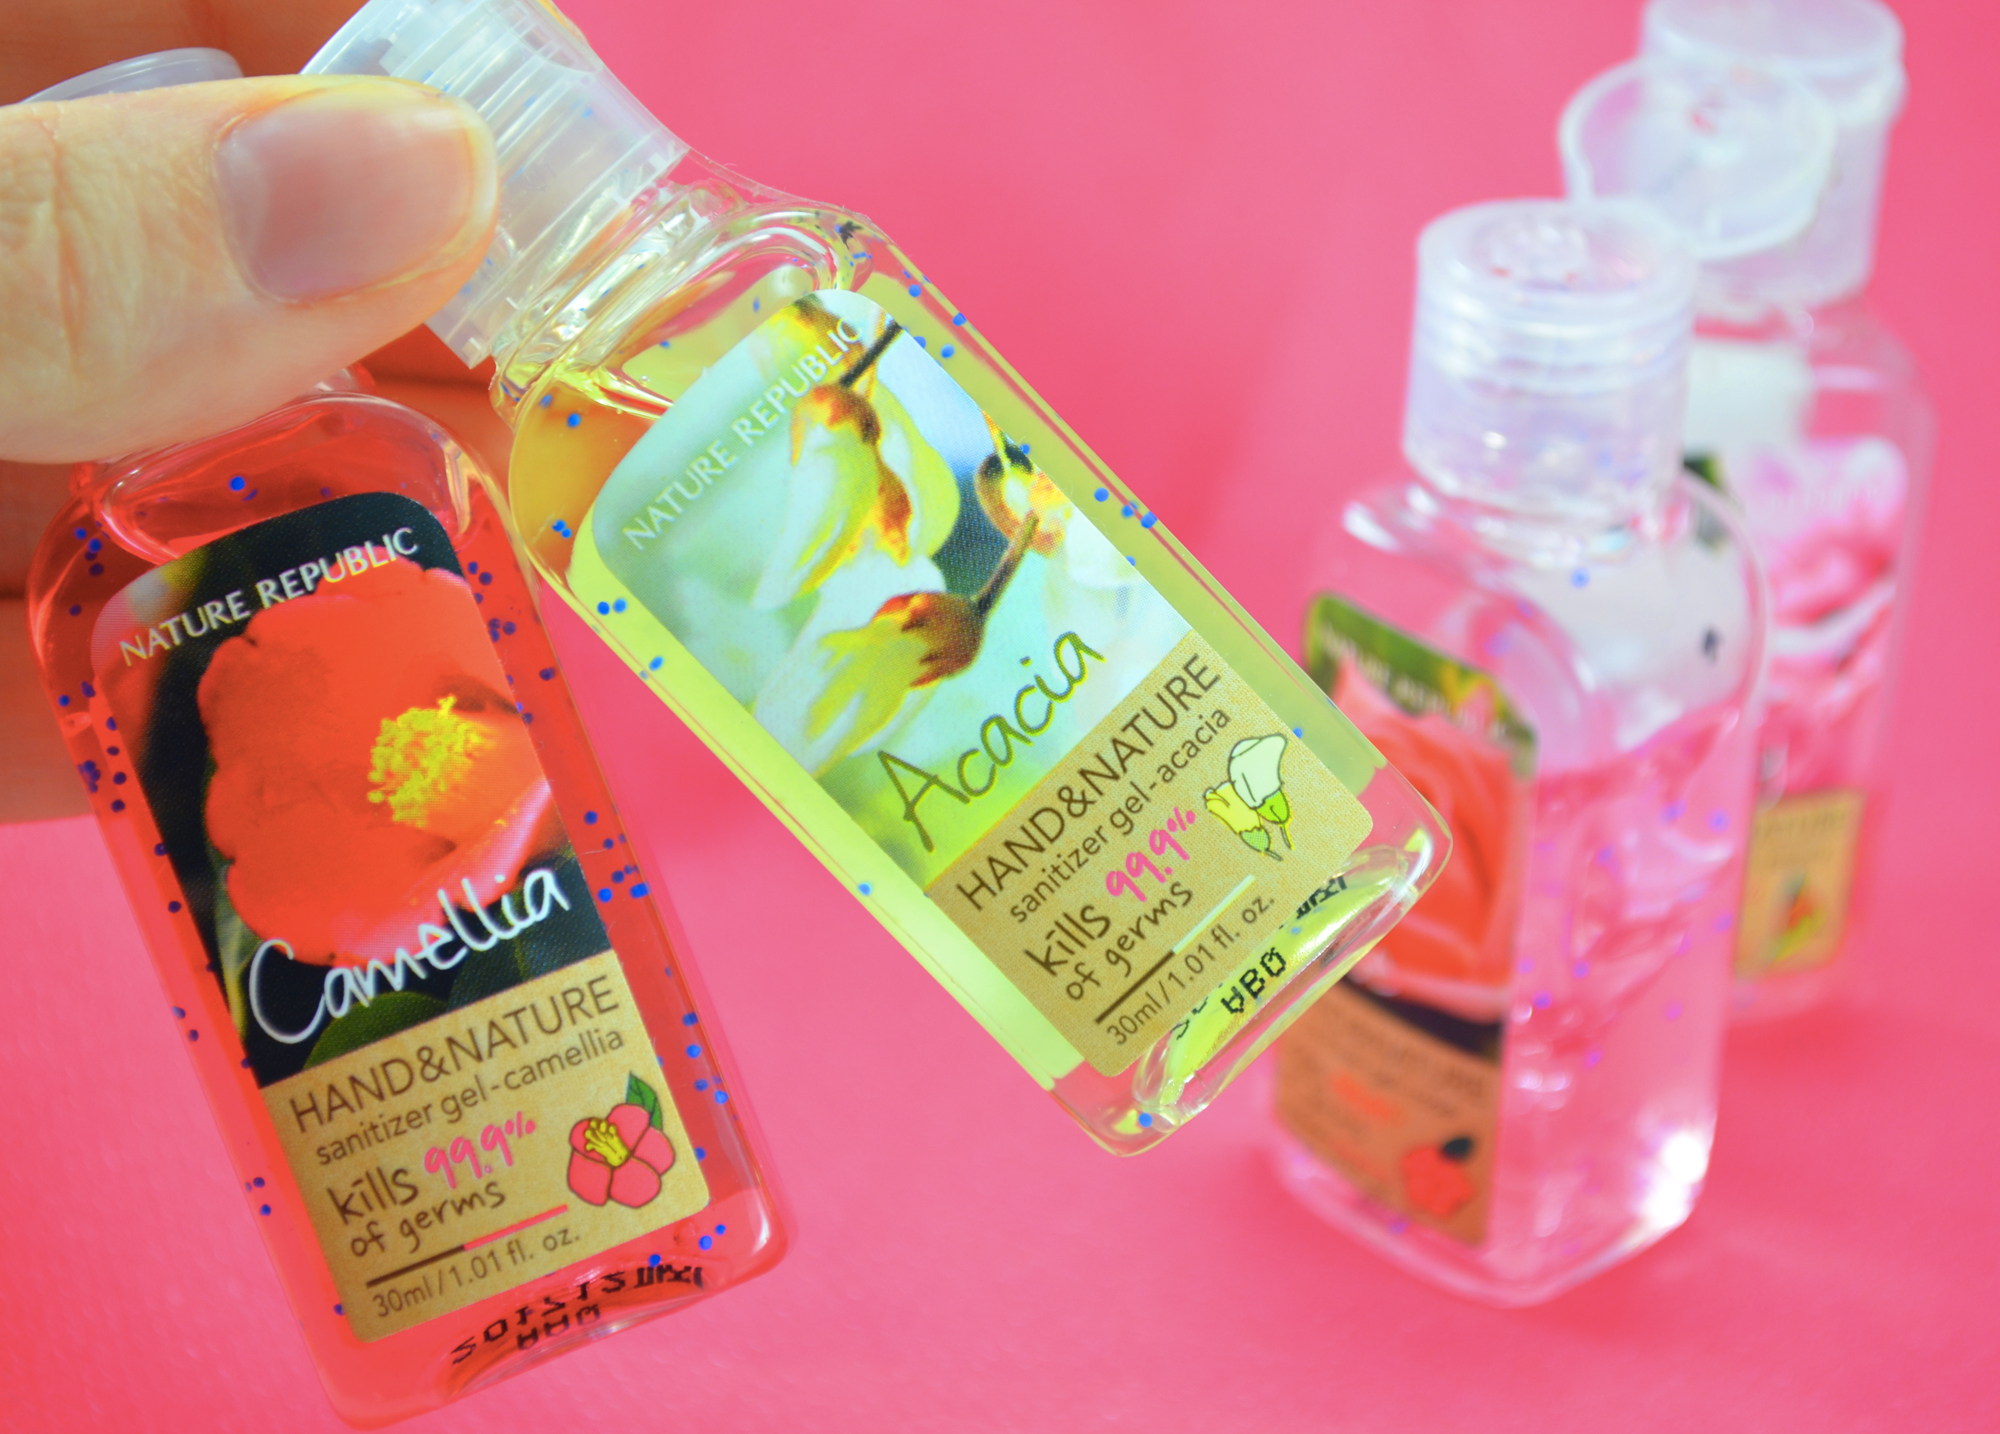 nature-republic-hand-and-nature-sanitizer-gel-camellia-acacia-review